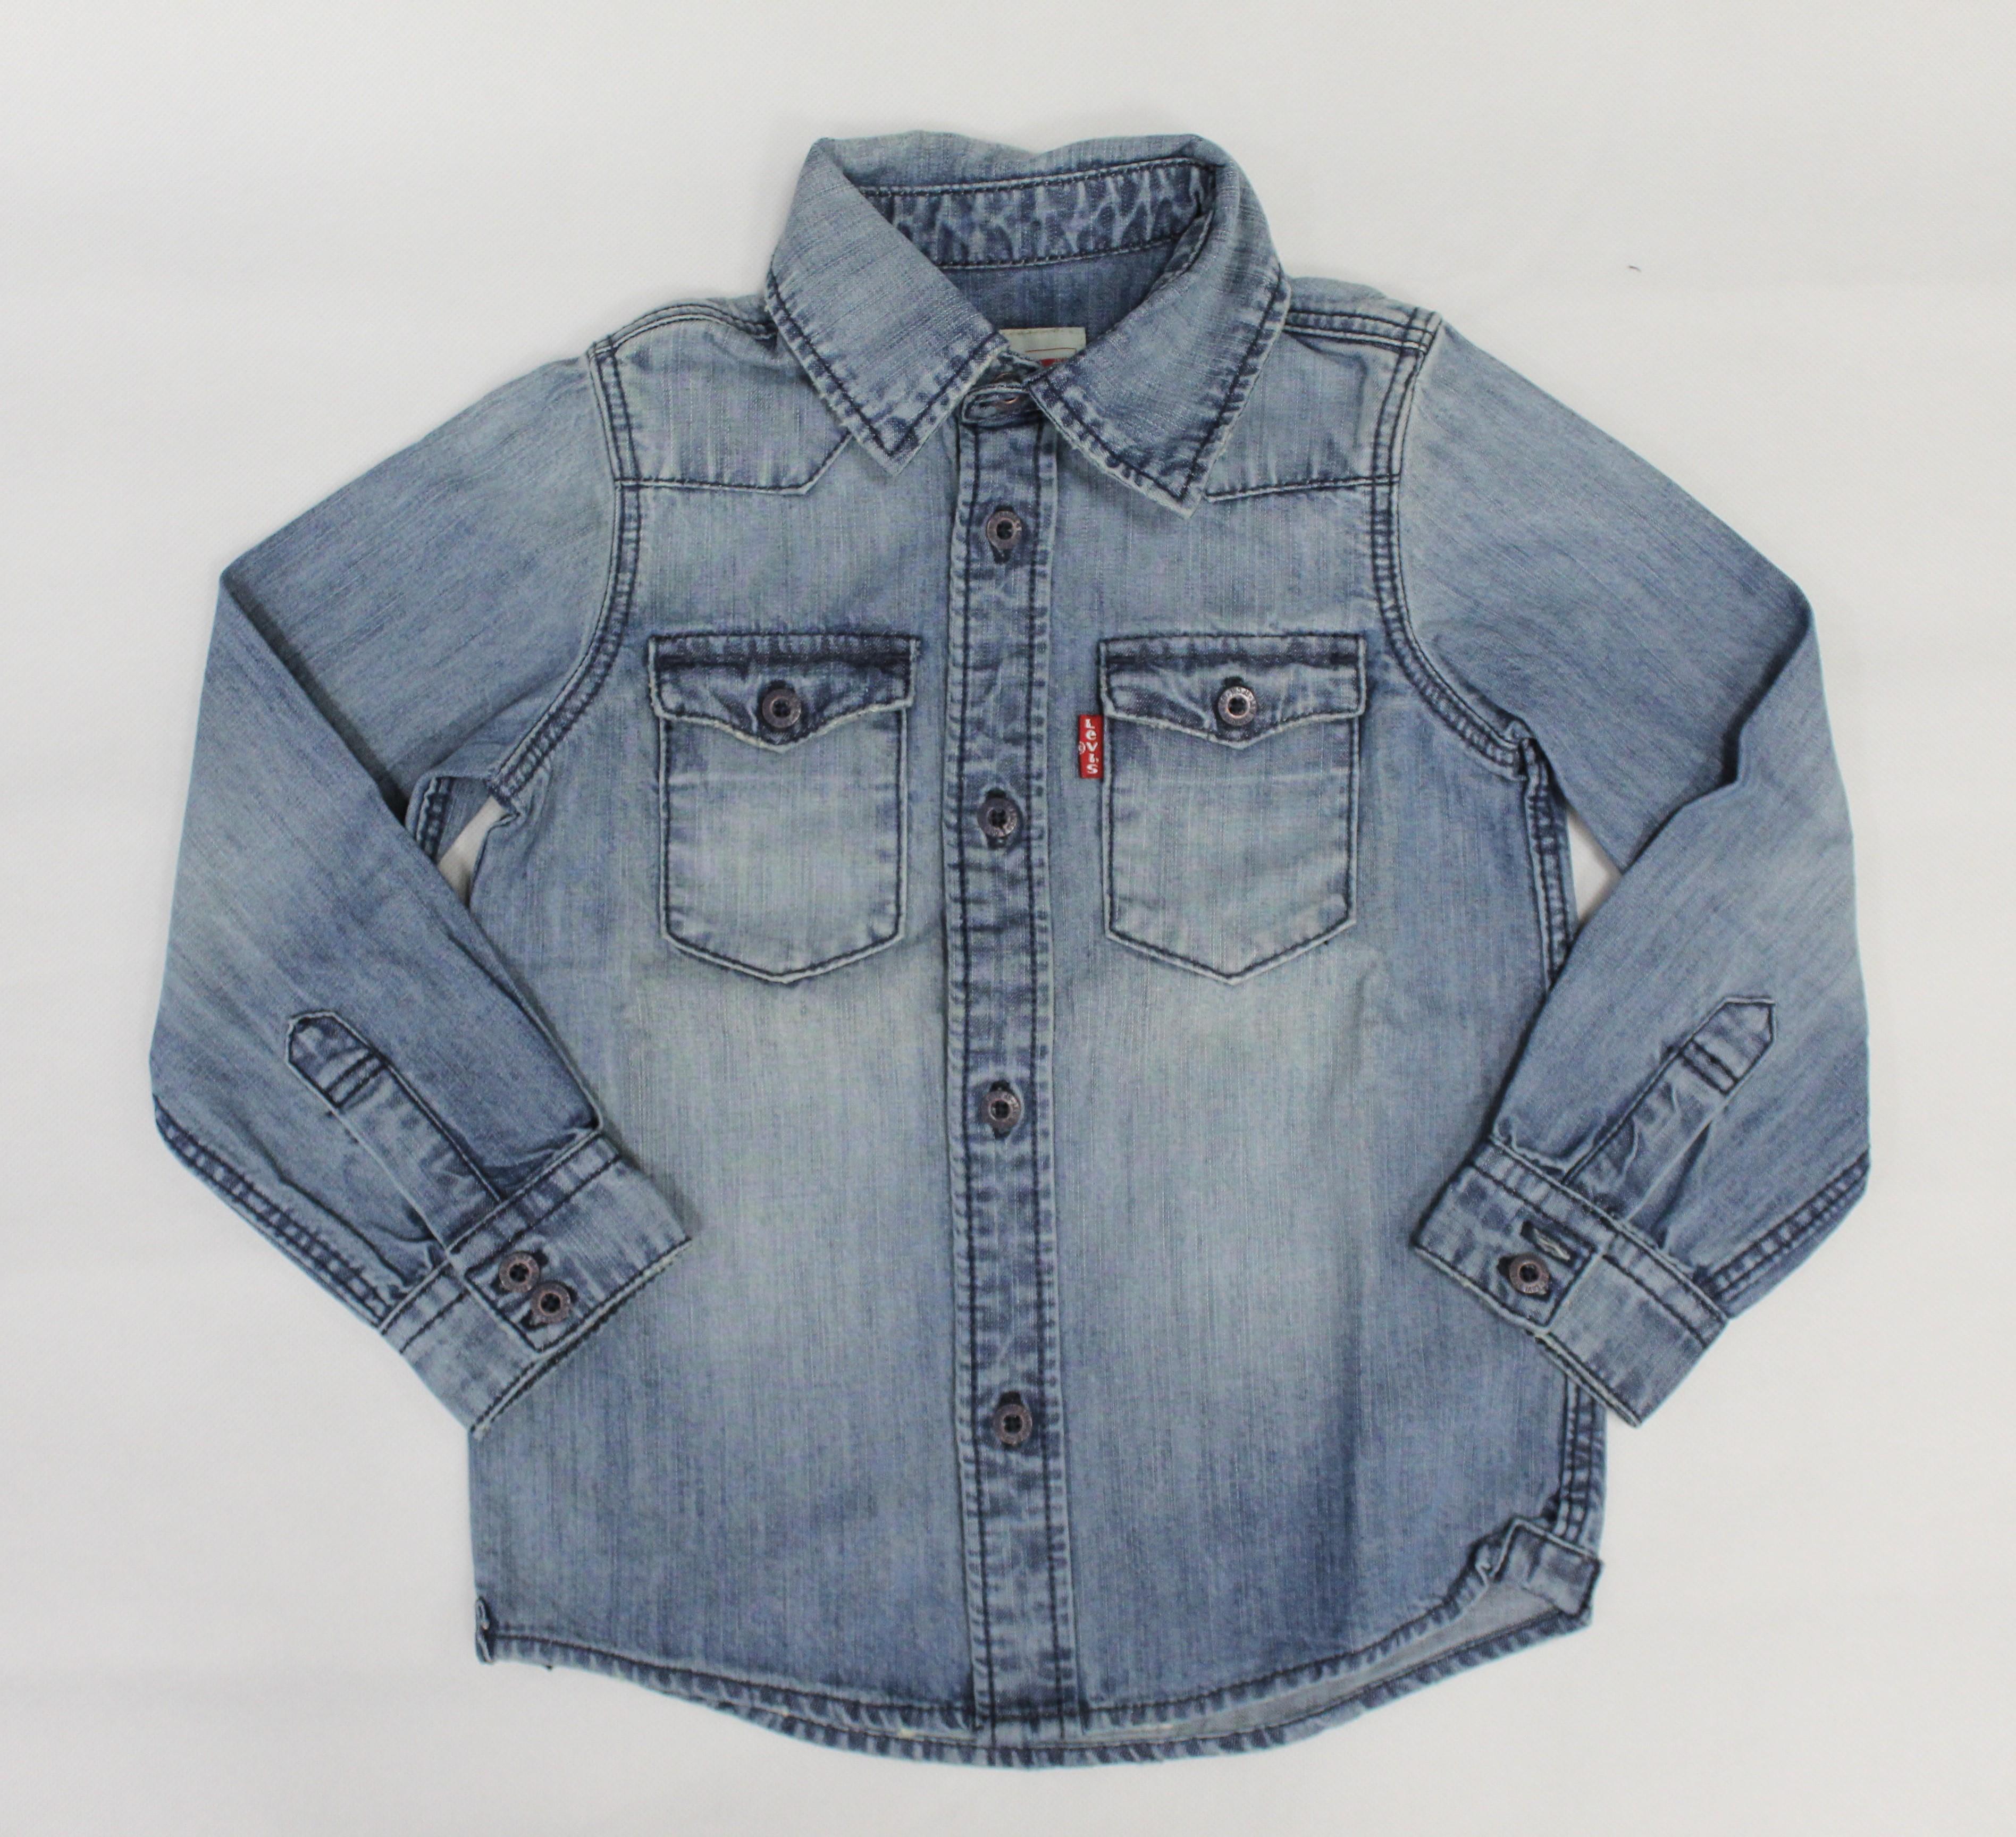 newest 83bcf 14df3 Camicia Jeans Levi's